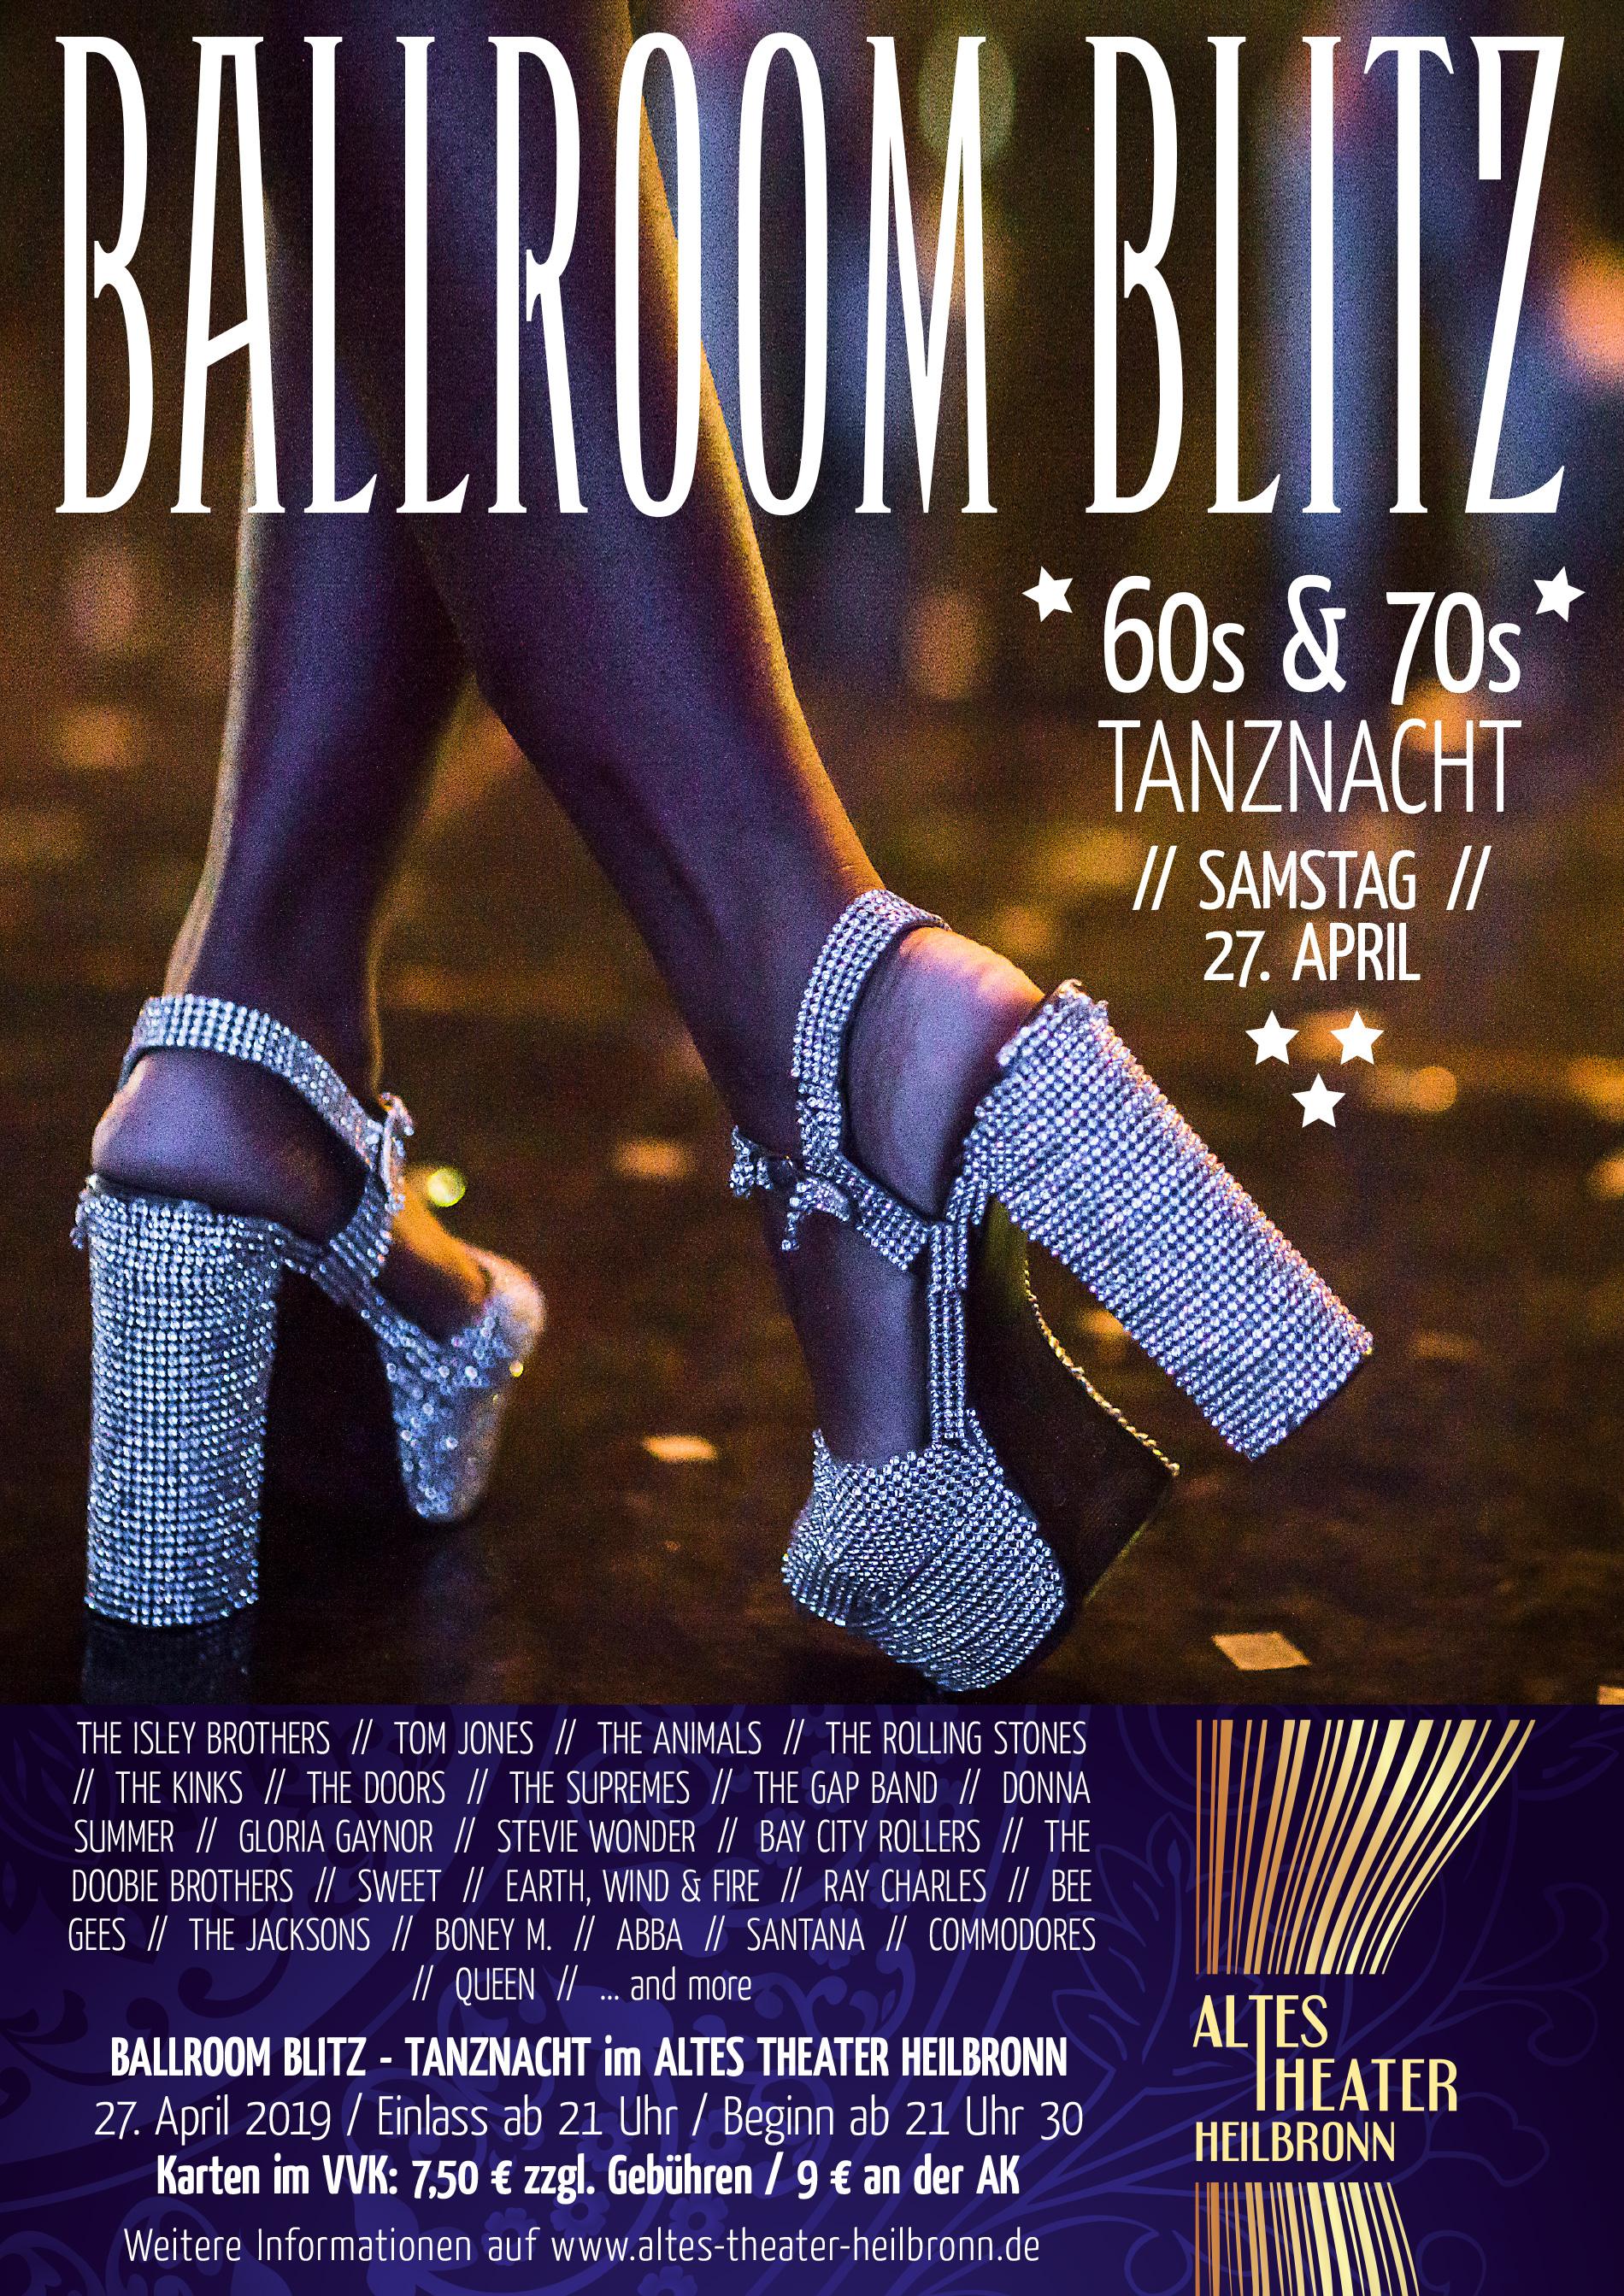 ATH-BALLROOM-BLITZ-2019-01.jpg